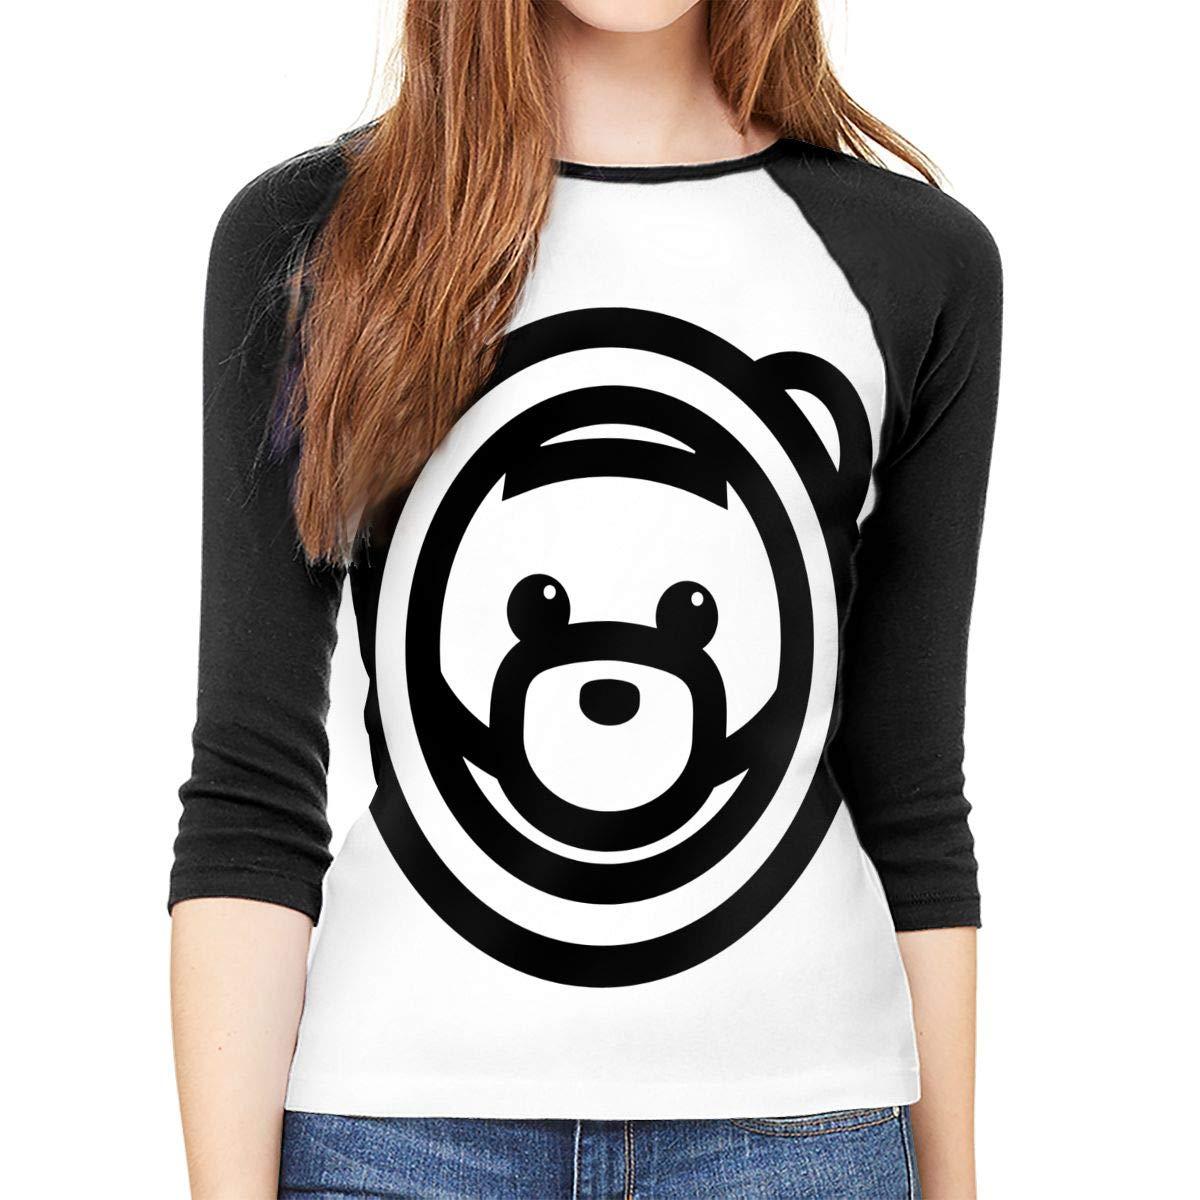 WangSiwe Ozuna Womens Shirt 3//4 Sleeve Casual Scoop Neck Tops Tee S-XXL Black T-Shirt